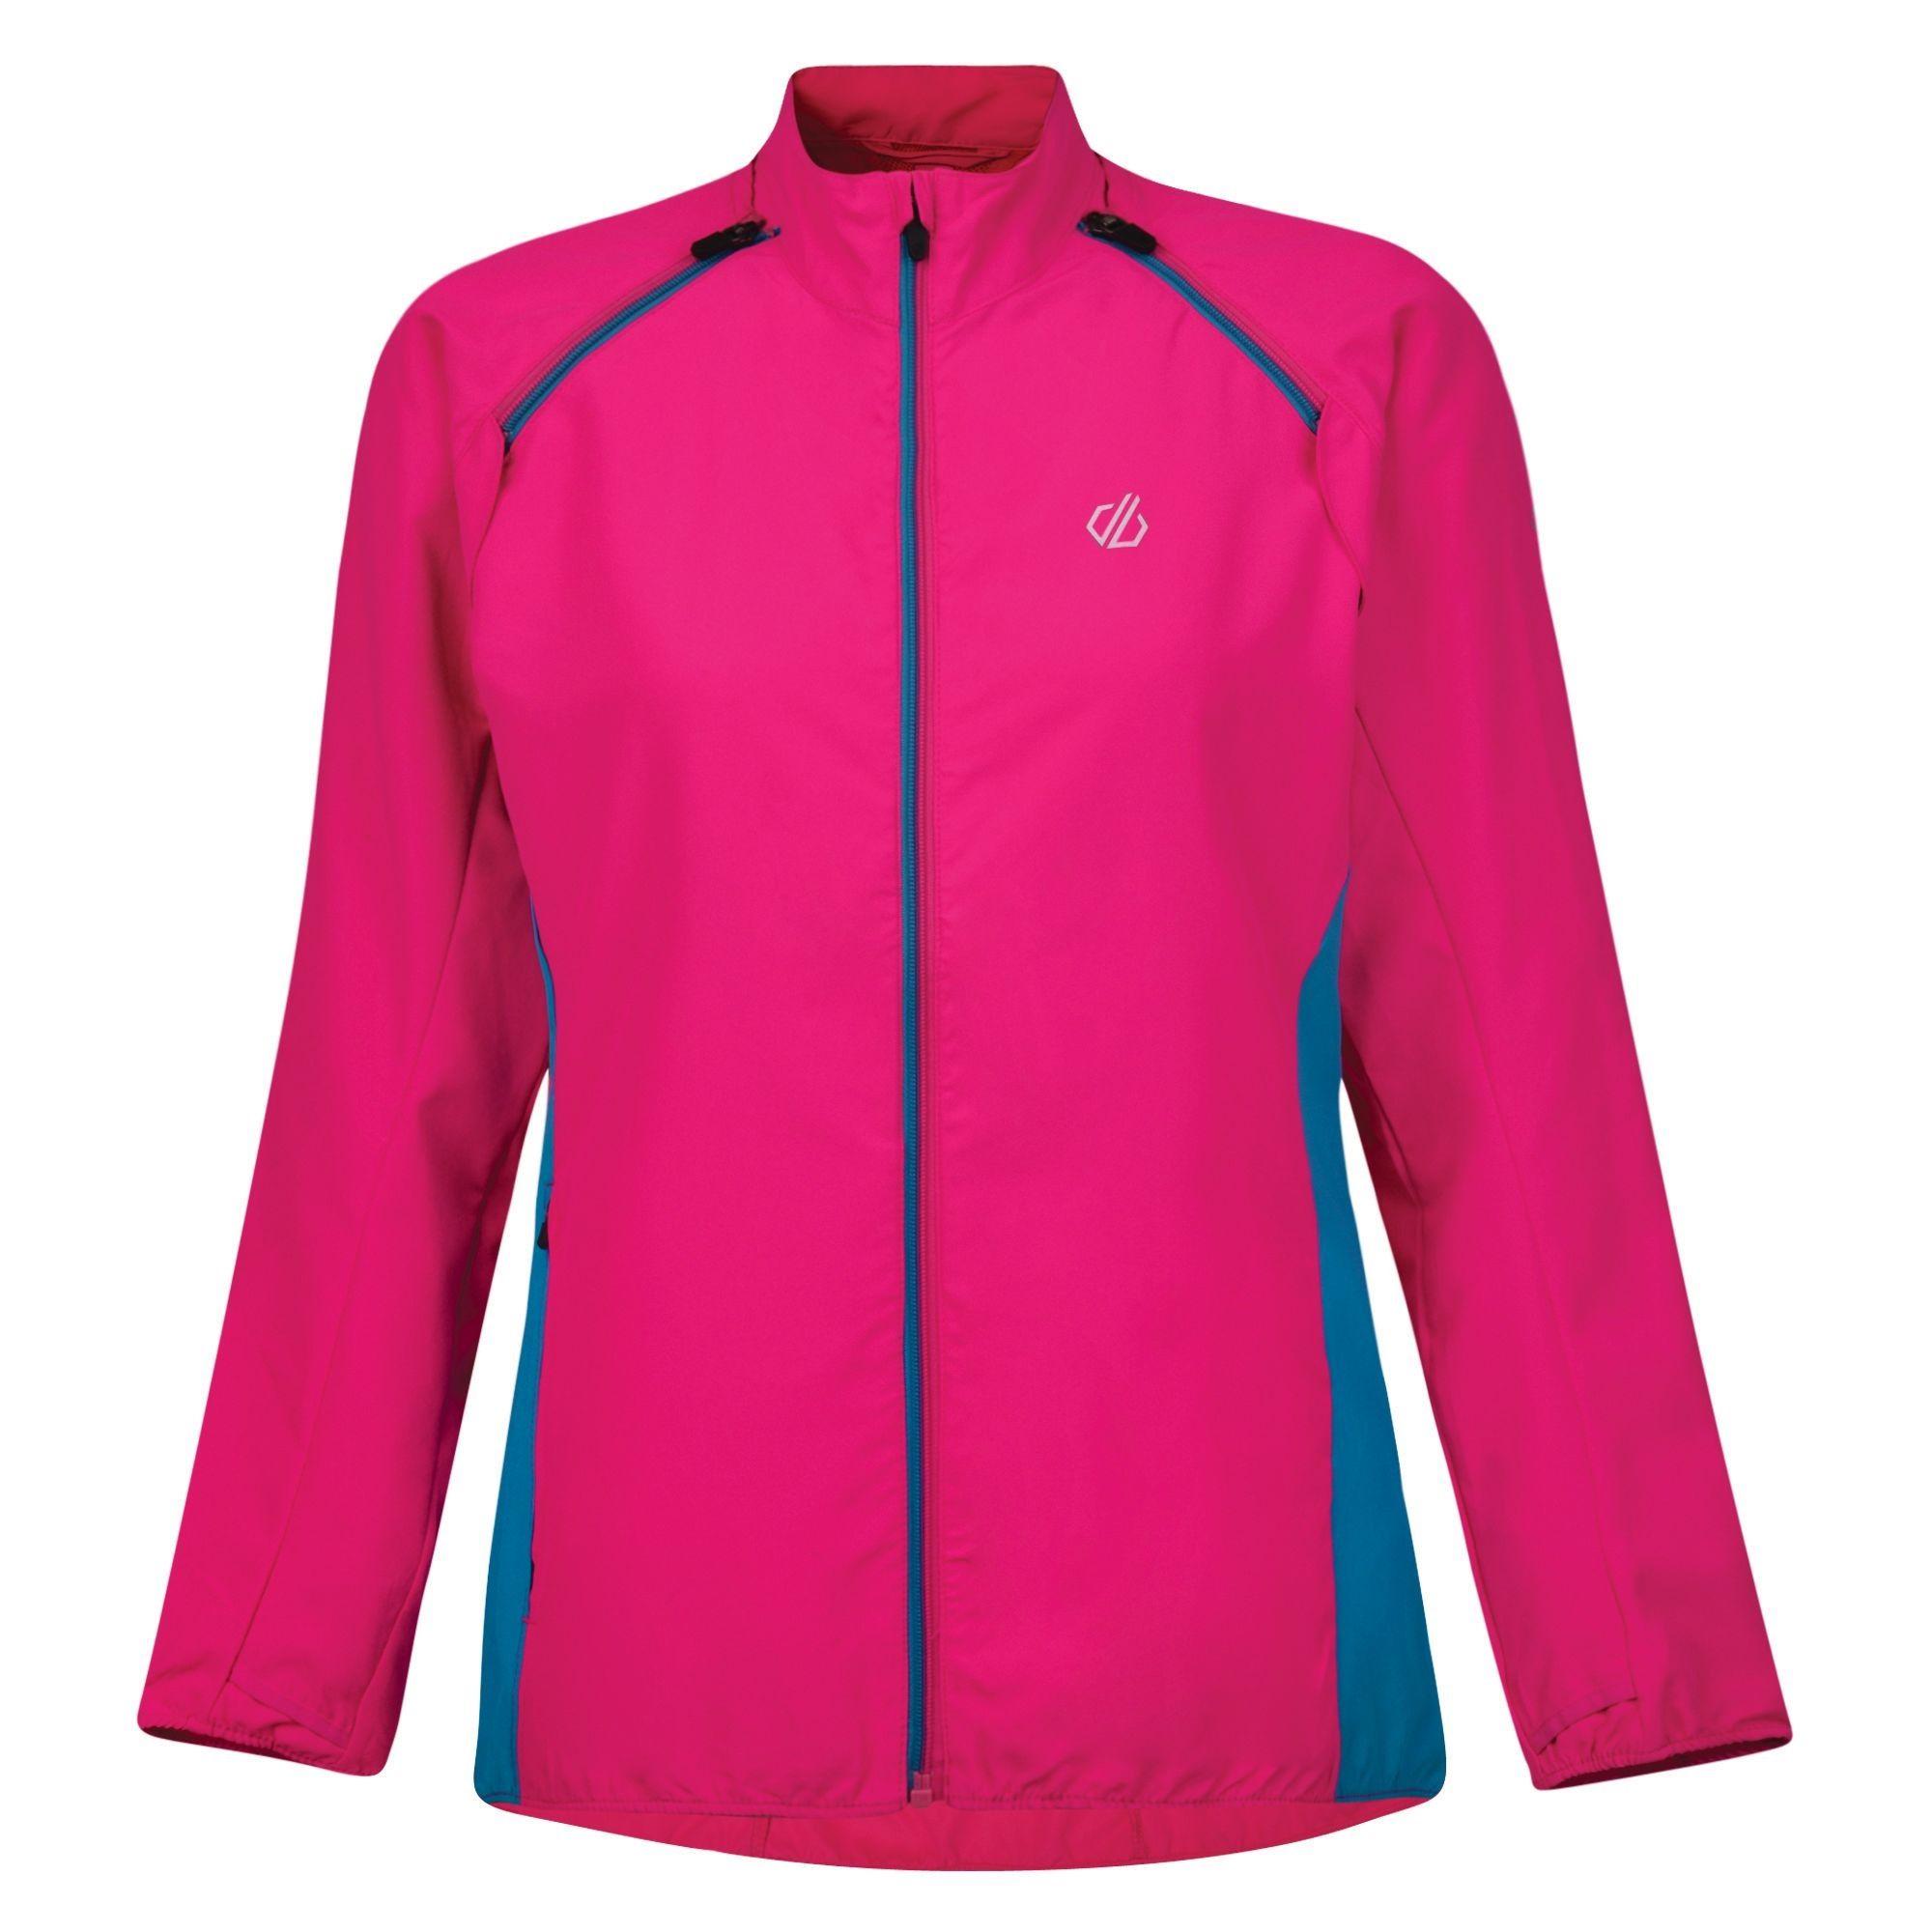 Dare 2B Womens/Ladies Circumspect Windshell Jacket